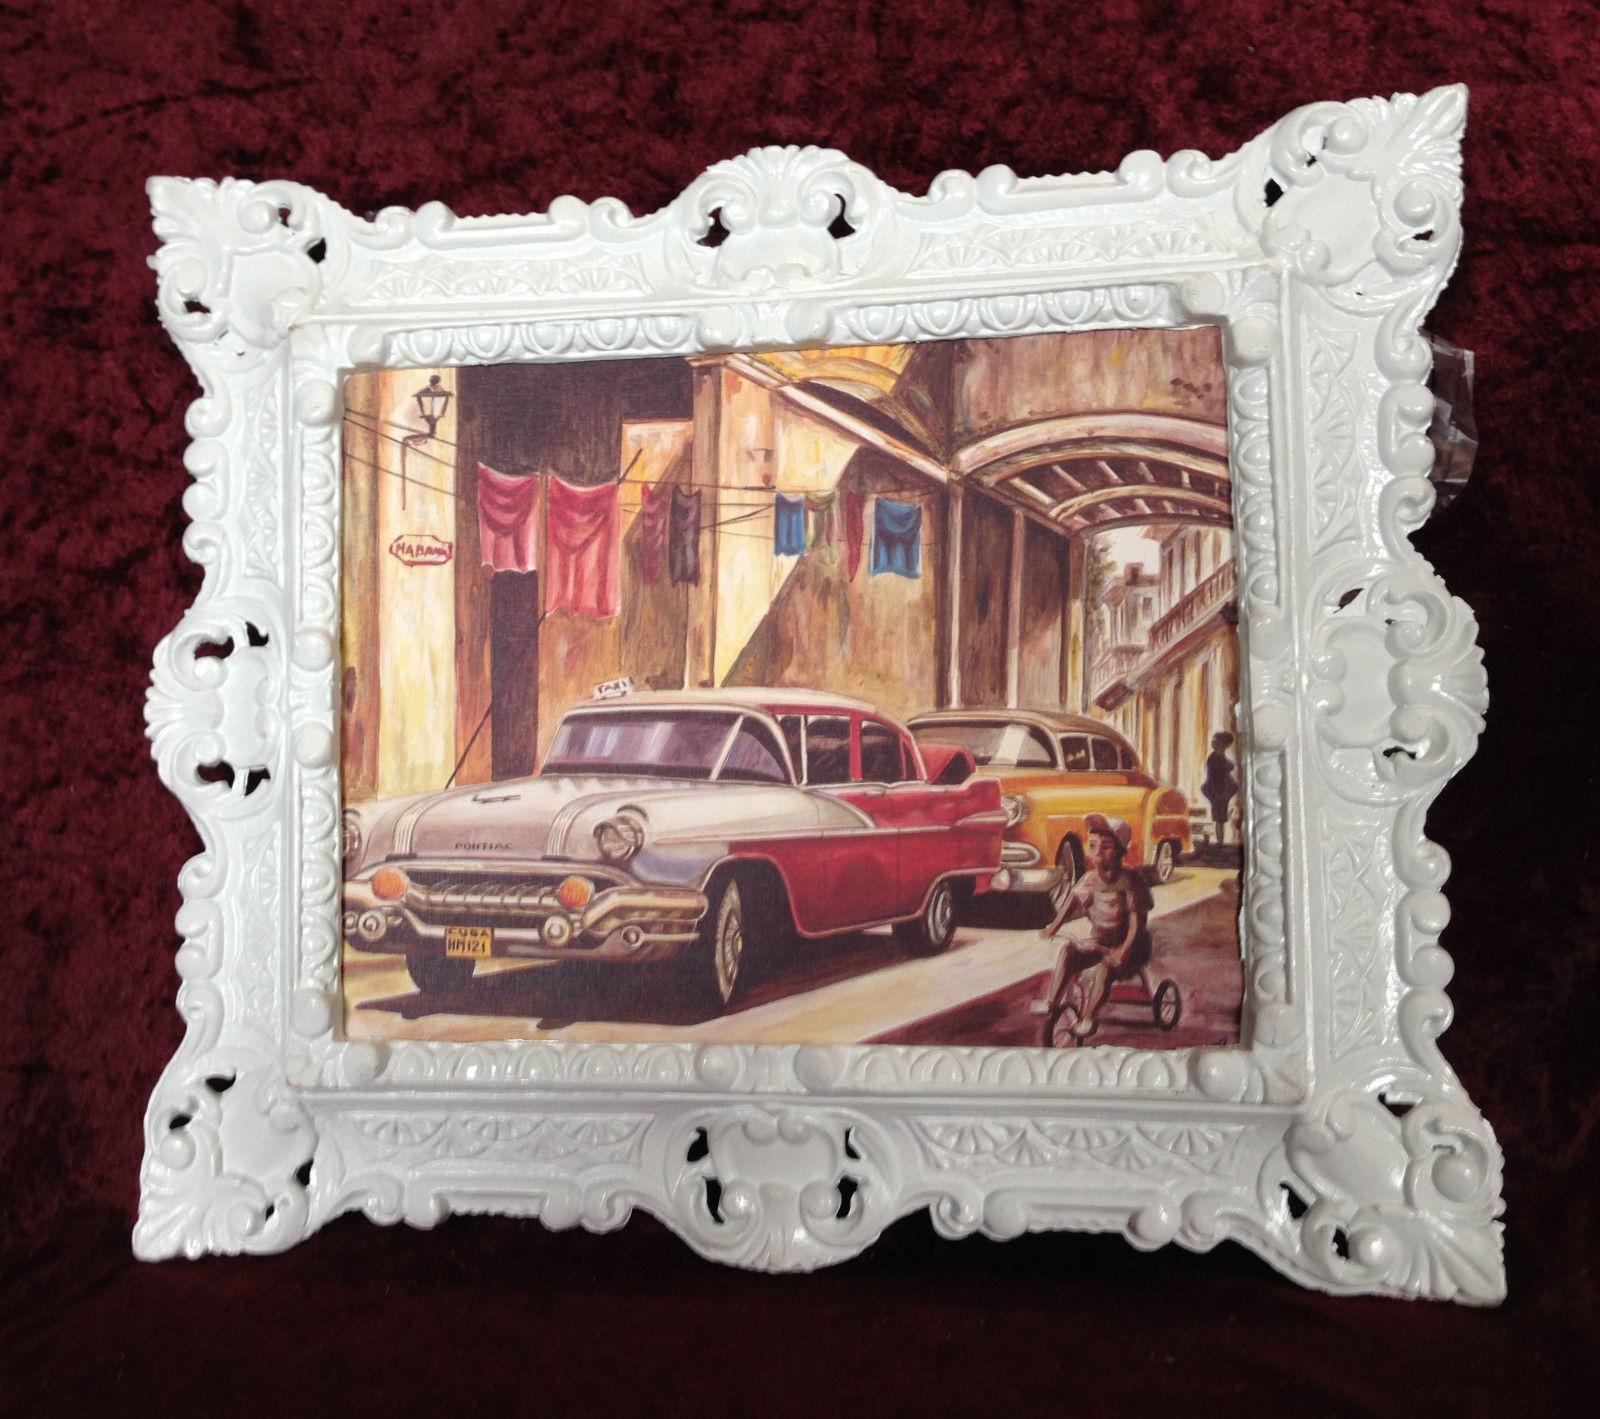 Auto Cuba Rot Bild Rahmen Weiß Wandbild 45x38 Oldtimer Classic Cuban ...